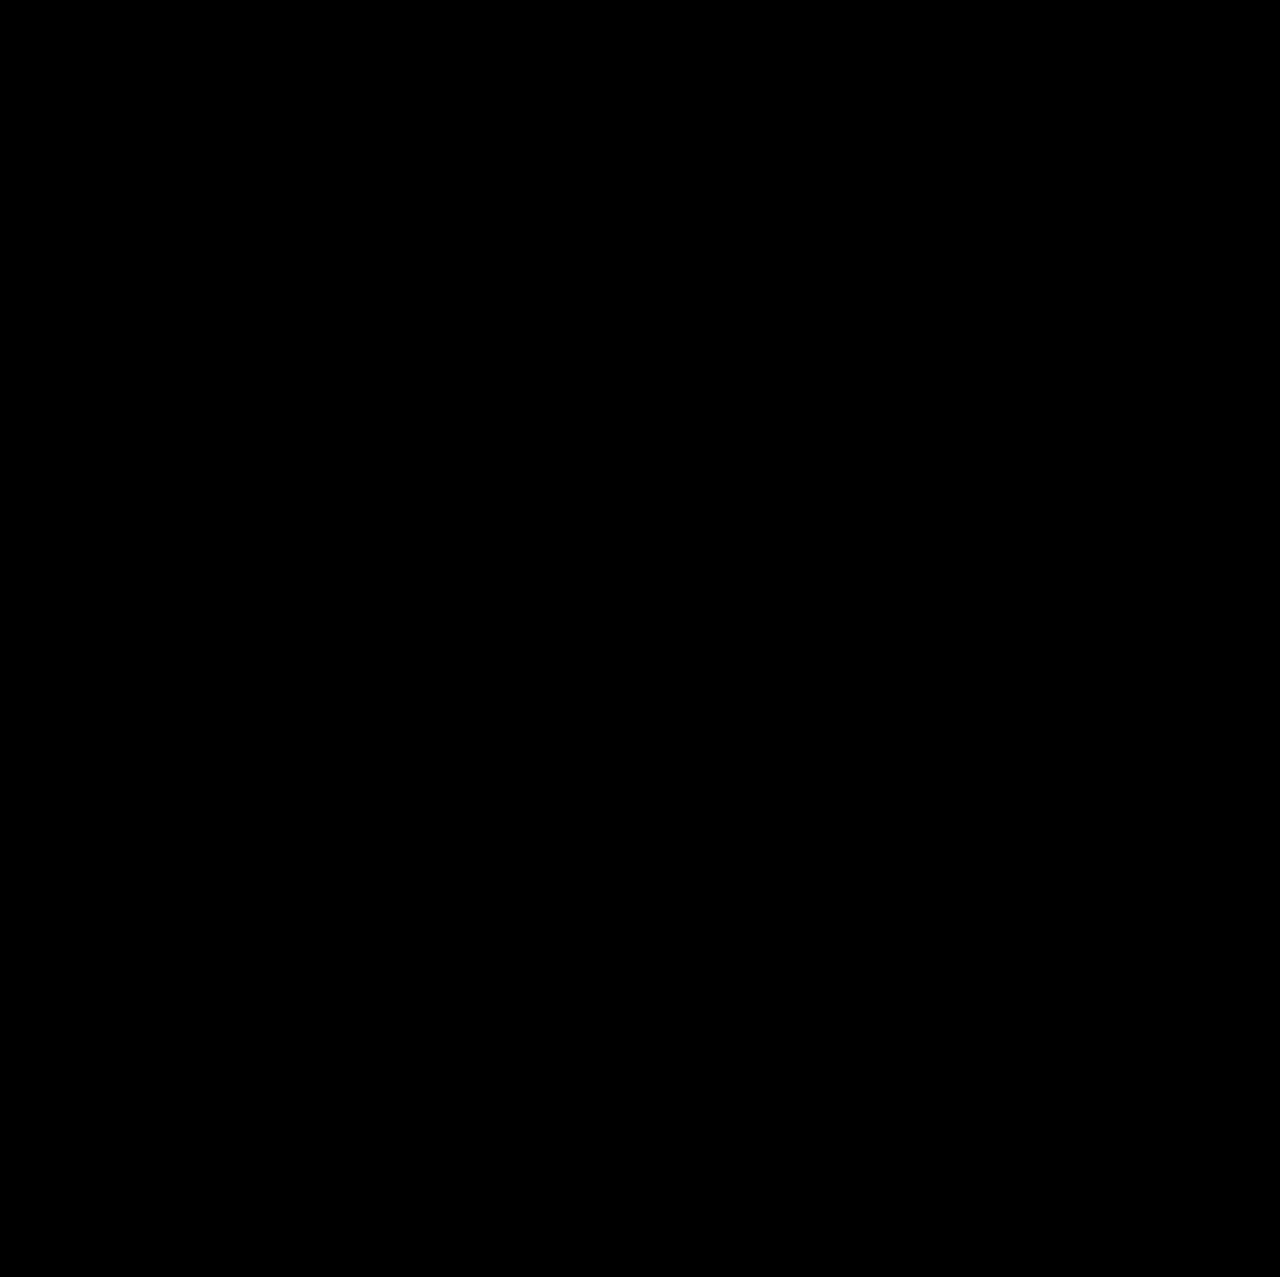 VORTEX PLUMES EN BLEU